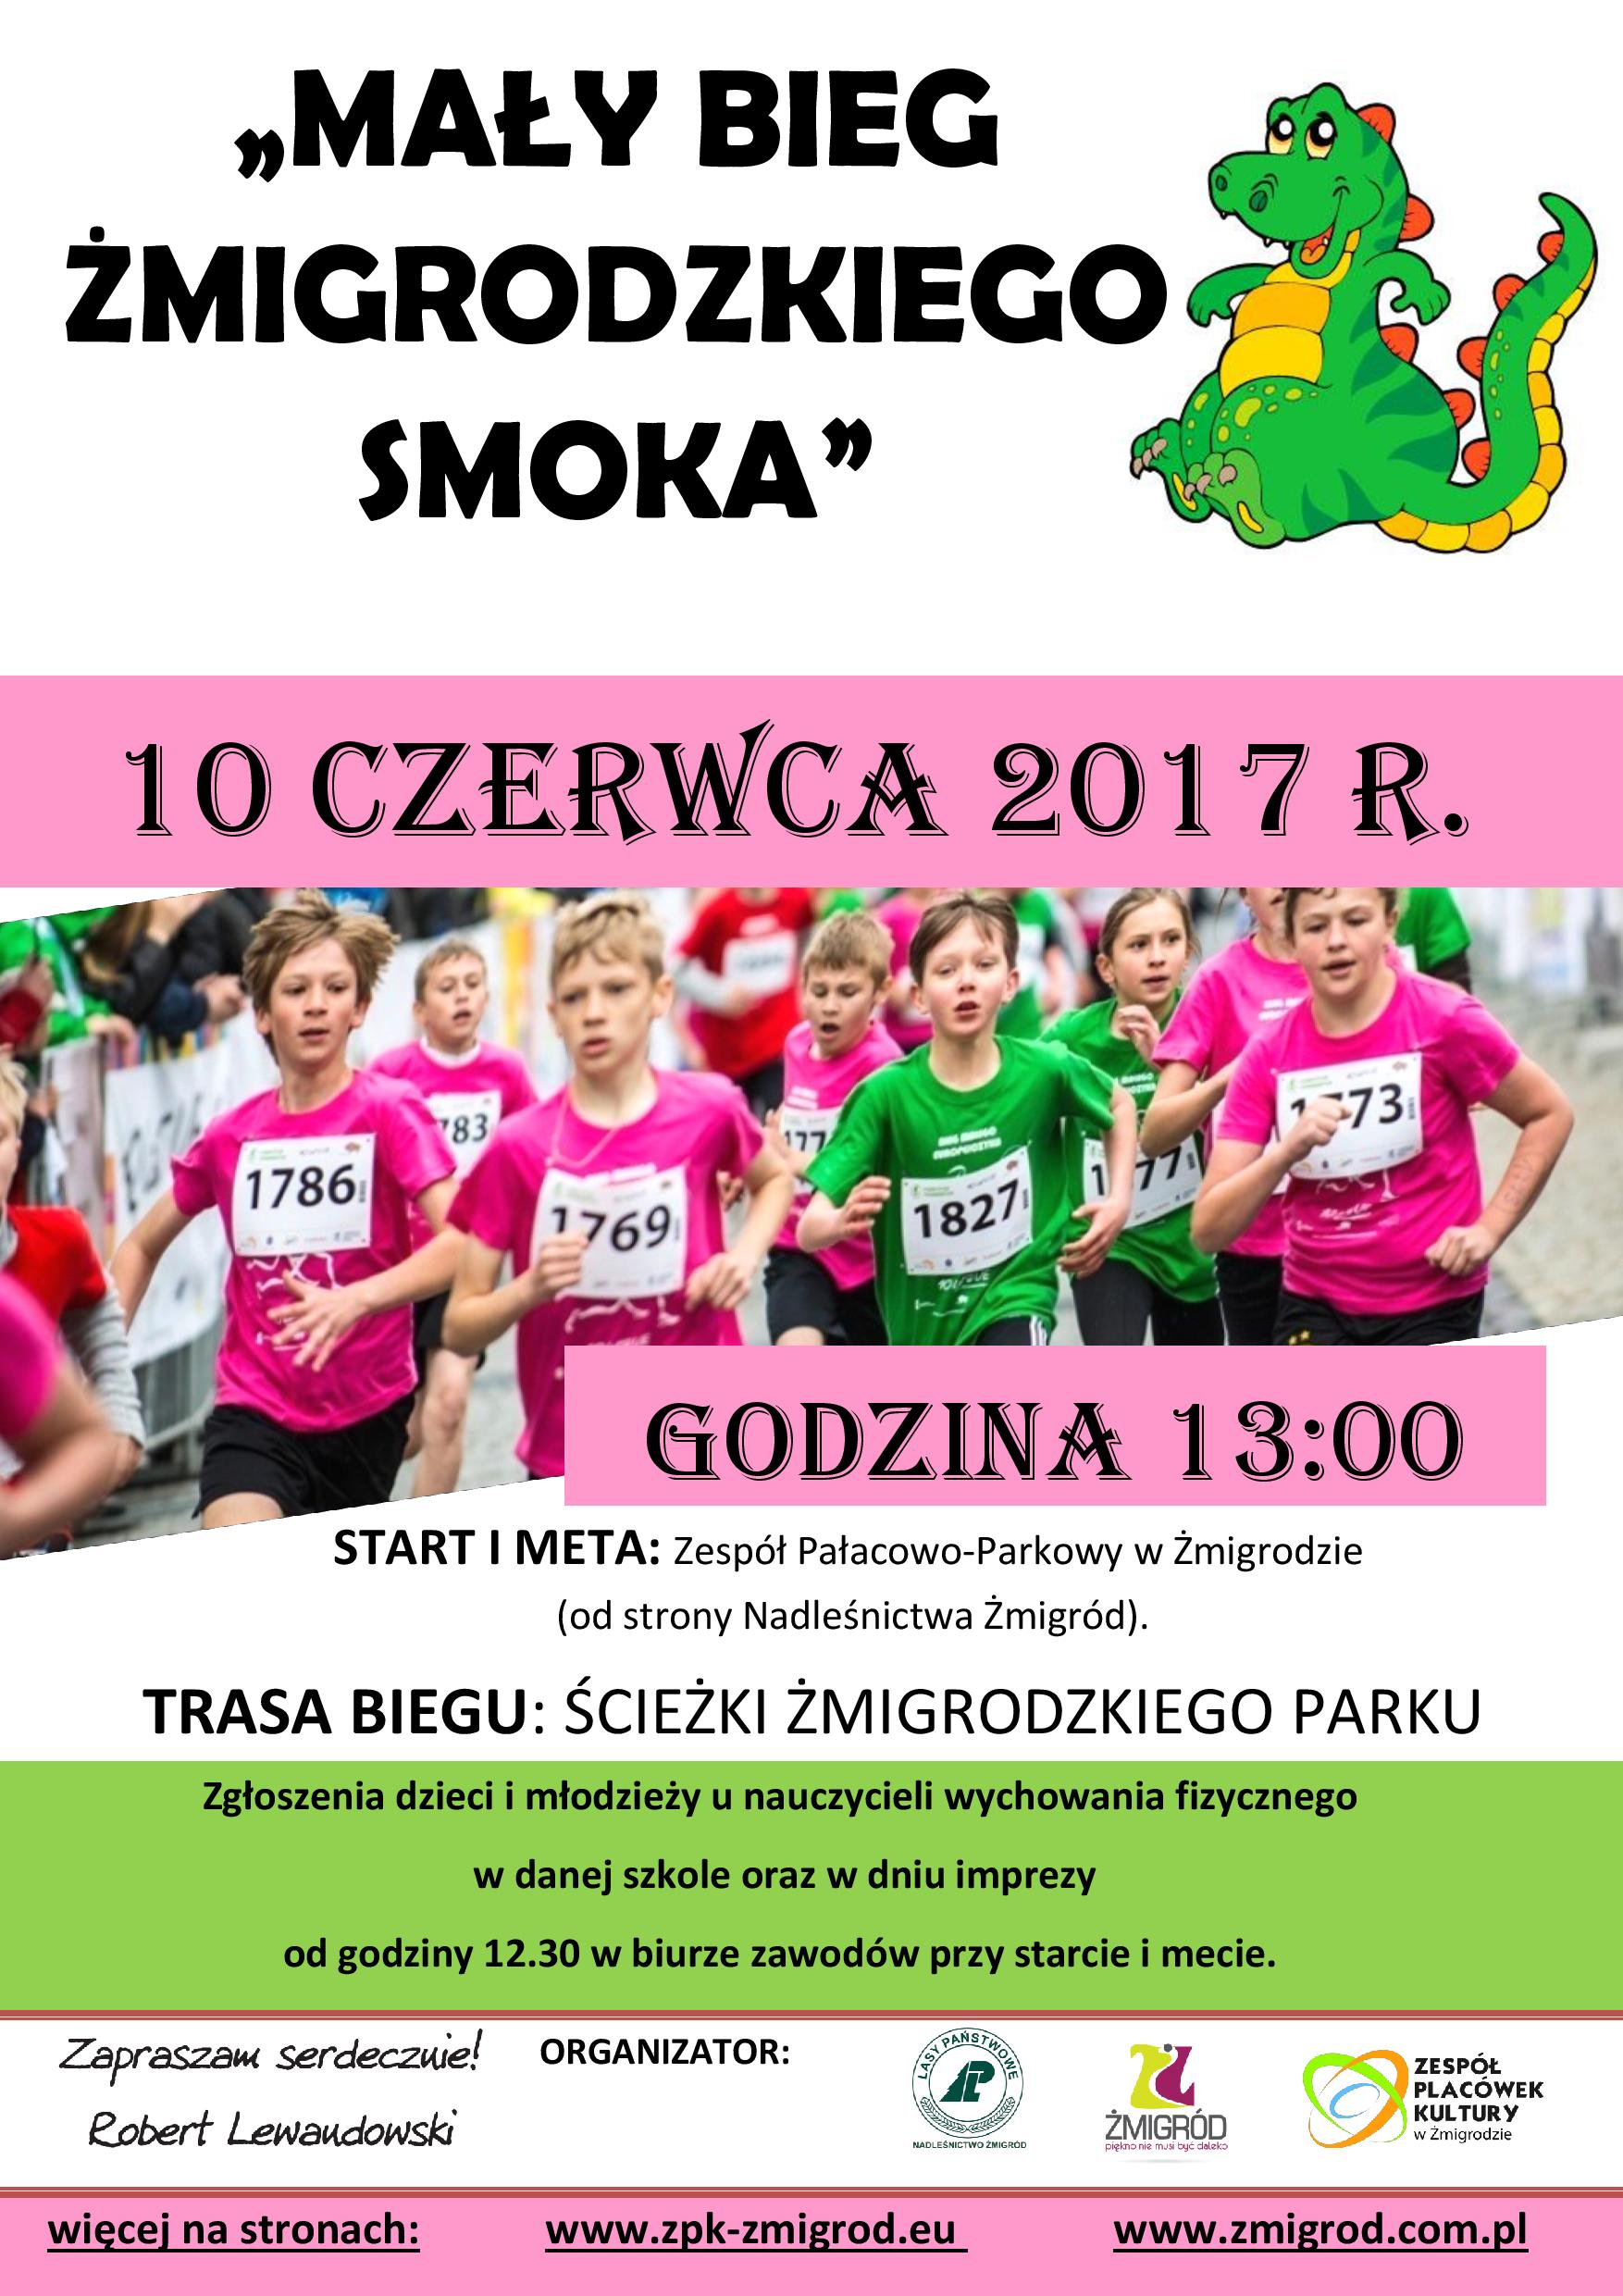 - maly_bieg_smoka-page-001.jpg